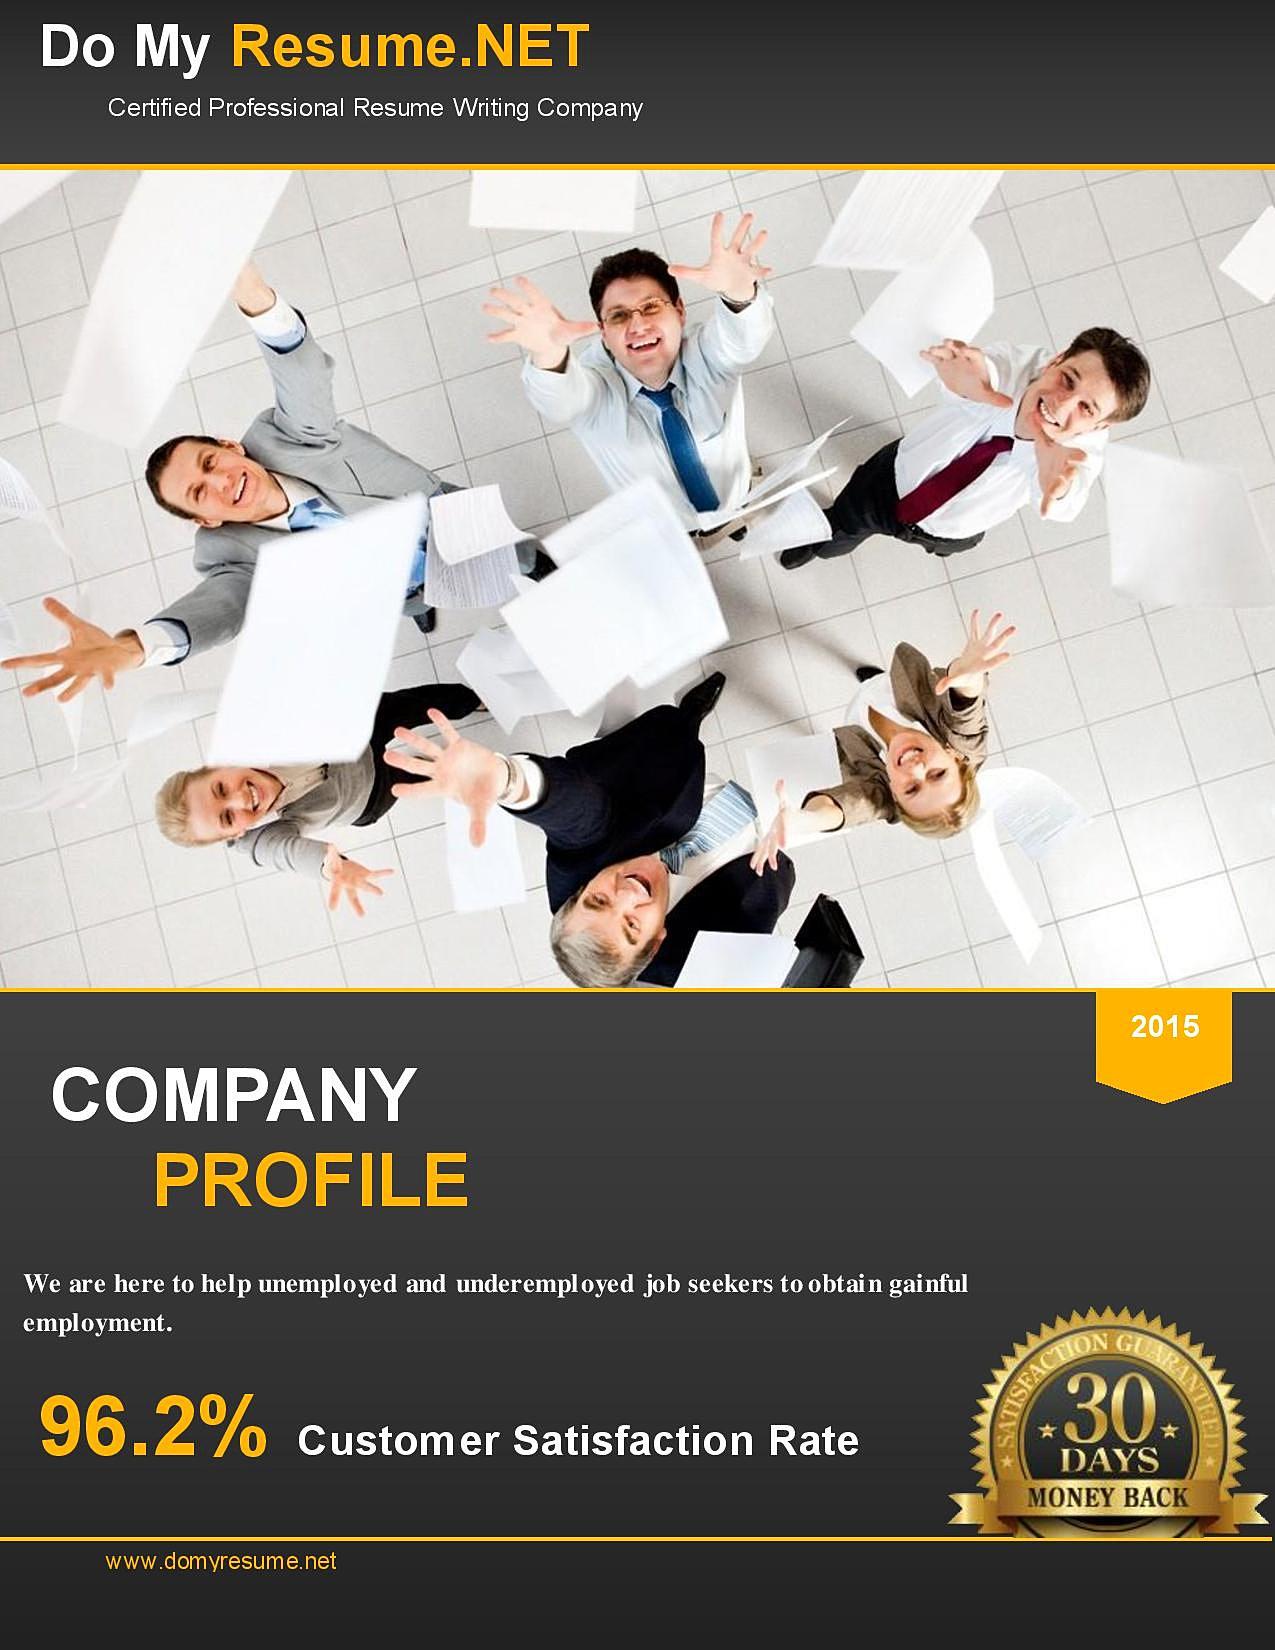 ranked 1 resume writing service in arizona do my resume net